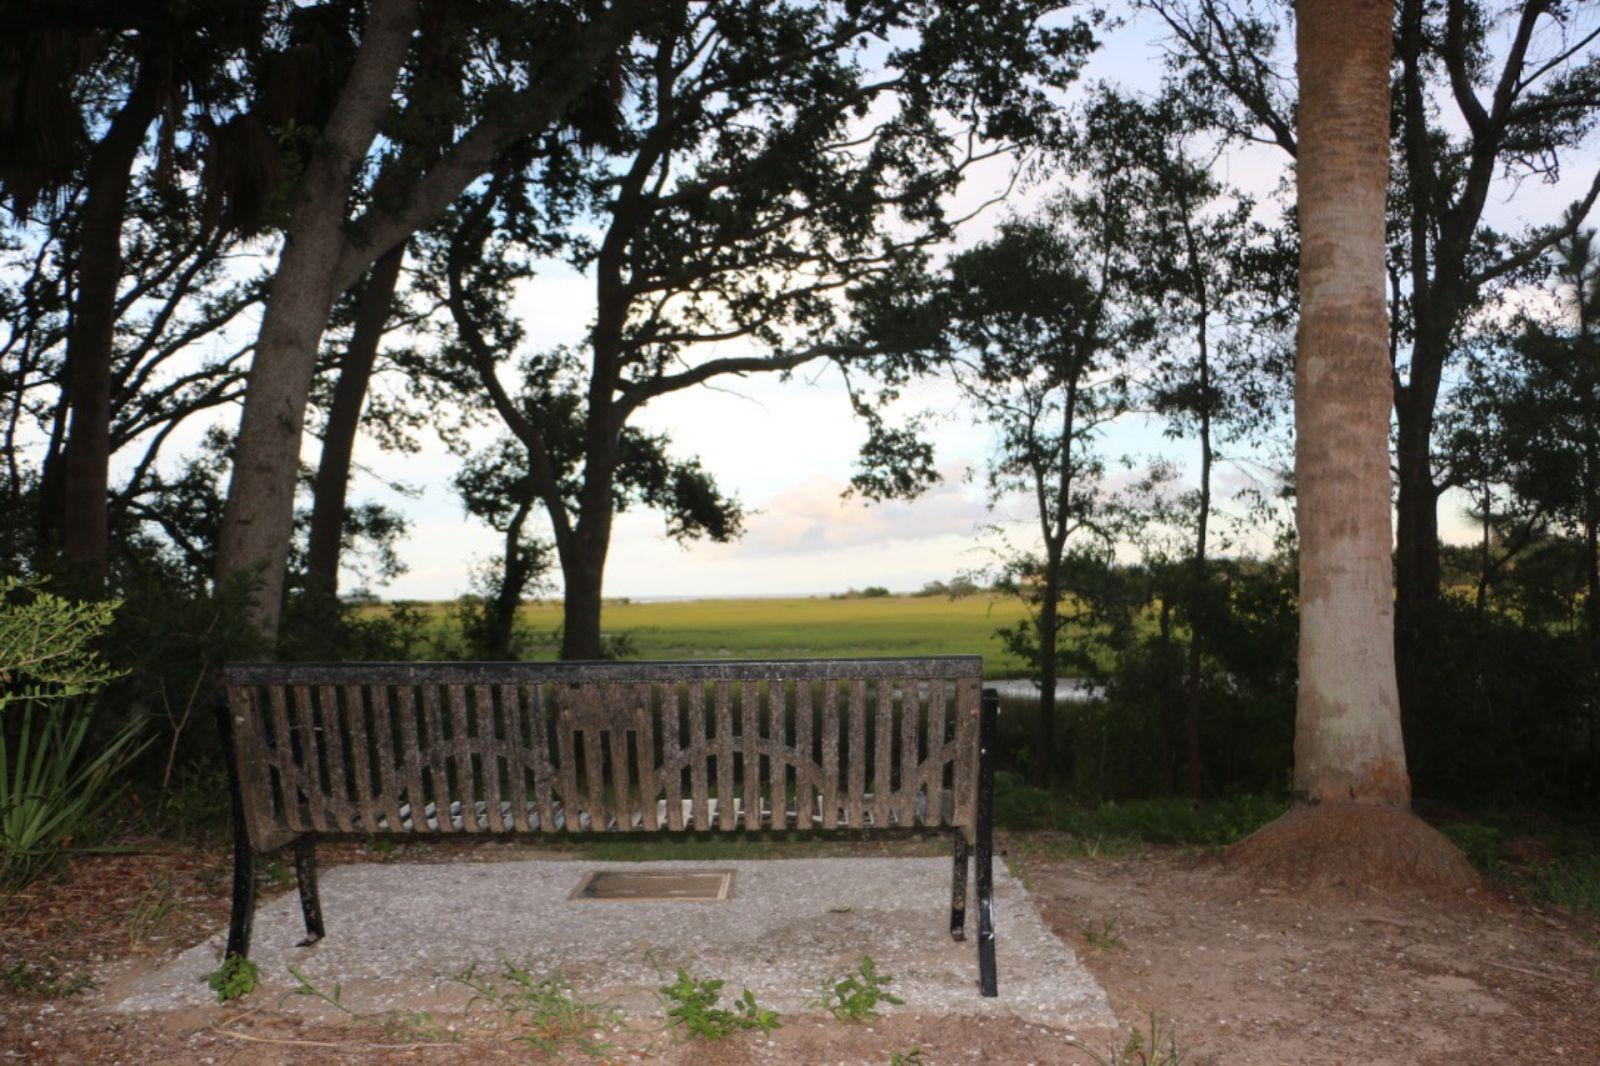 The Bench By the Road, Hilton Head, South Carolina